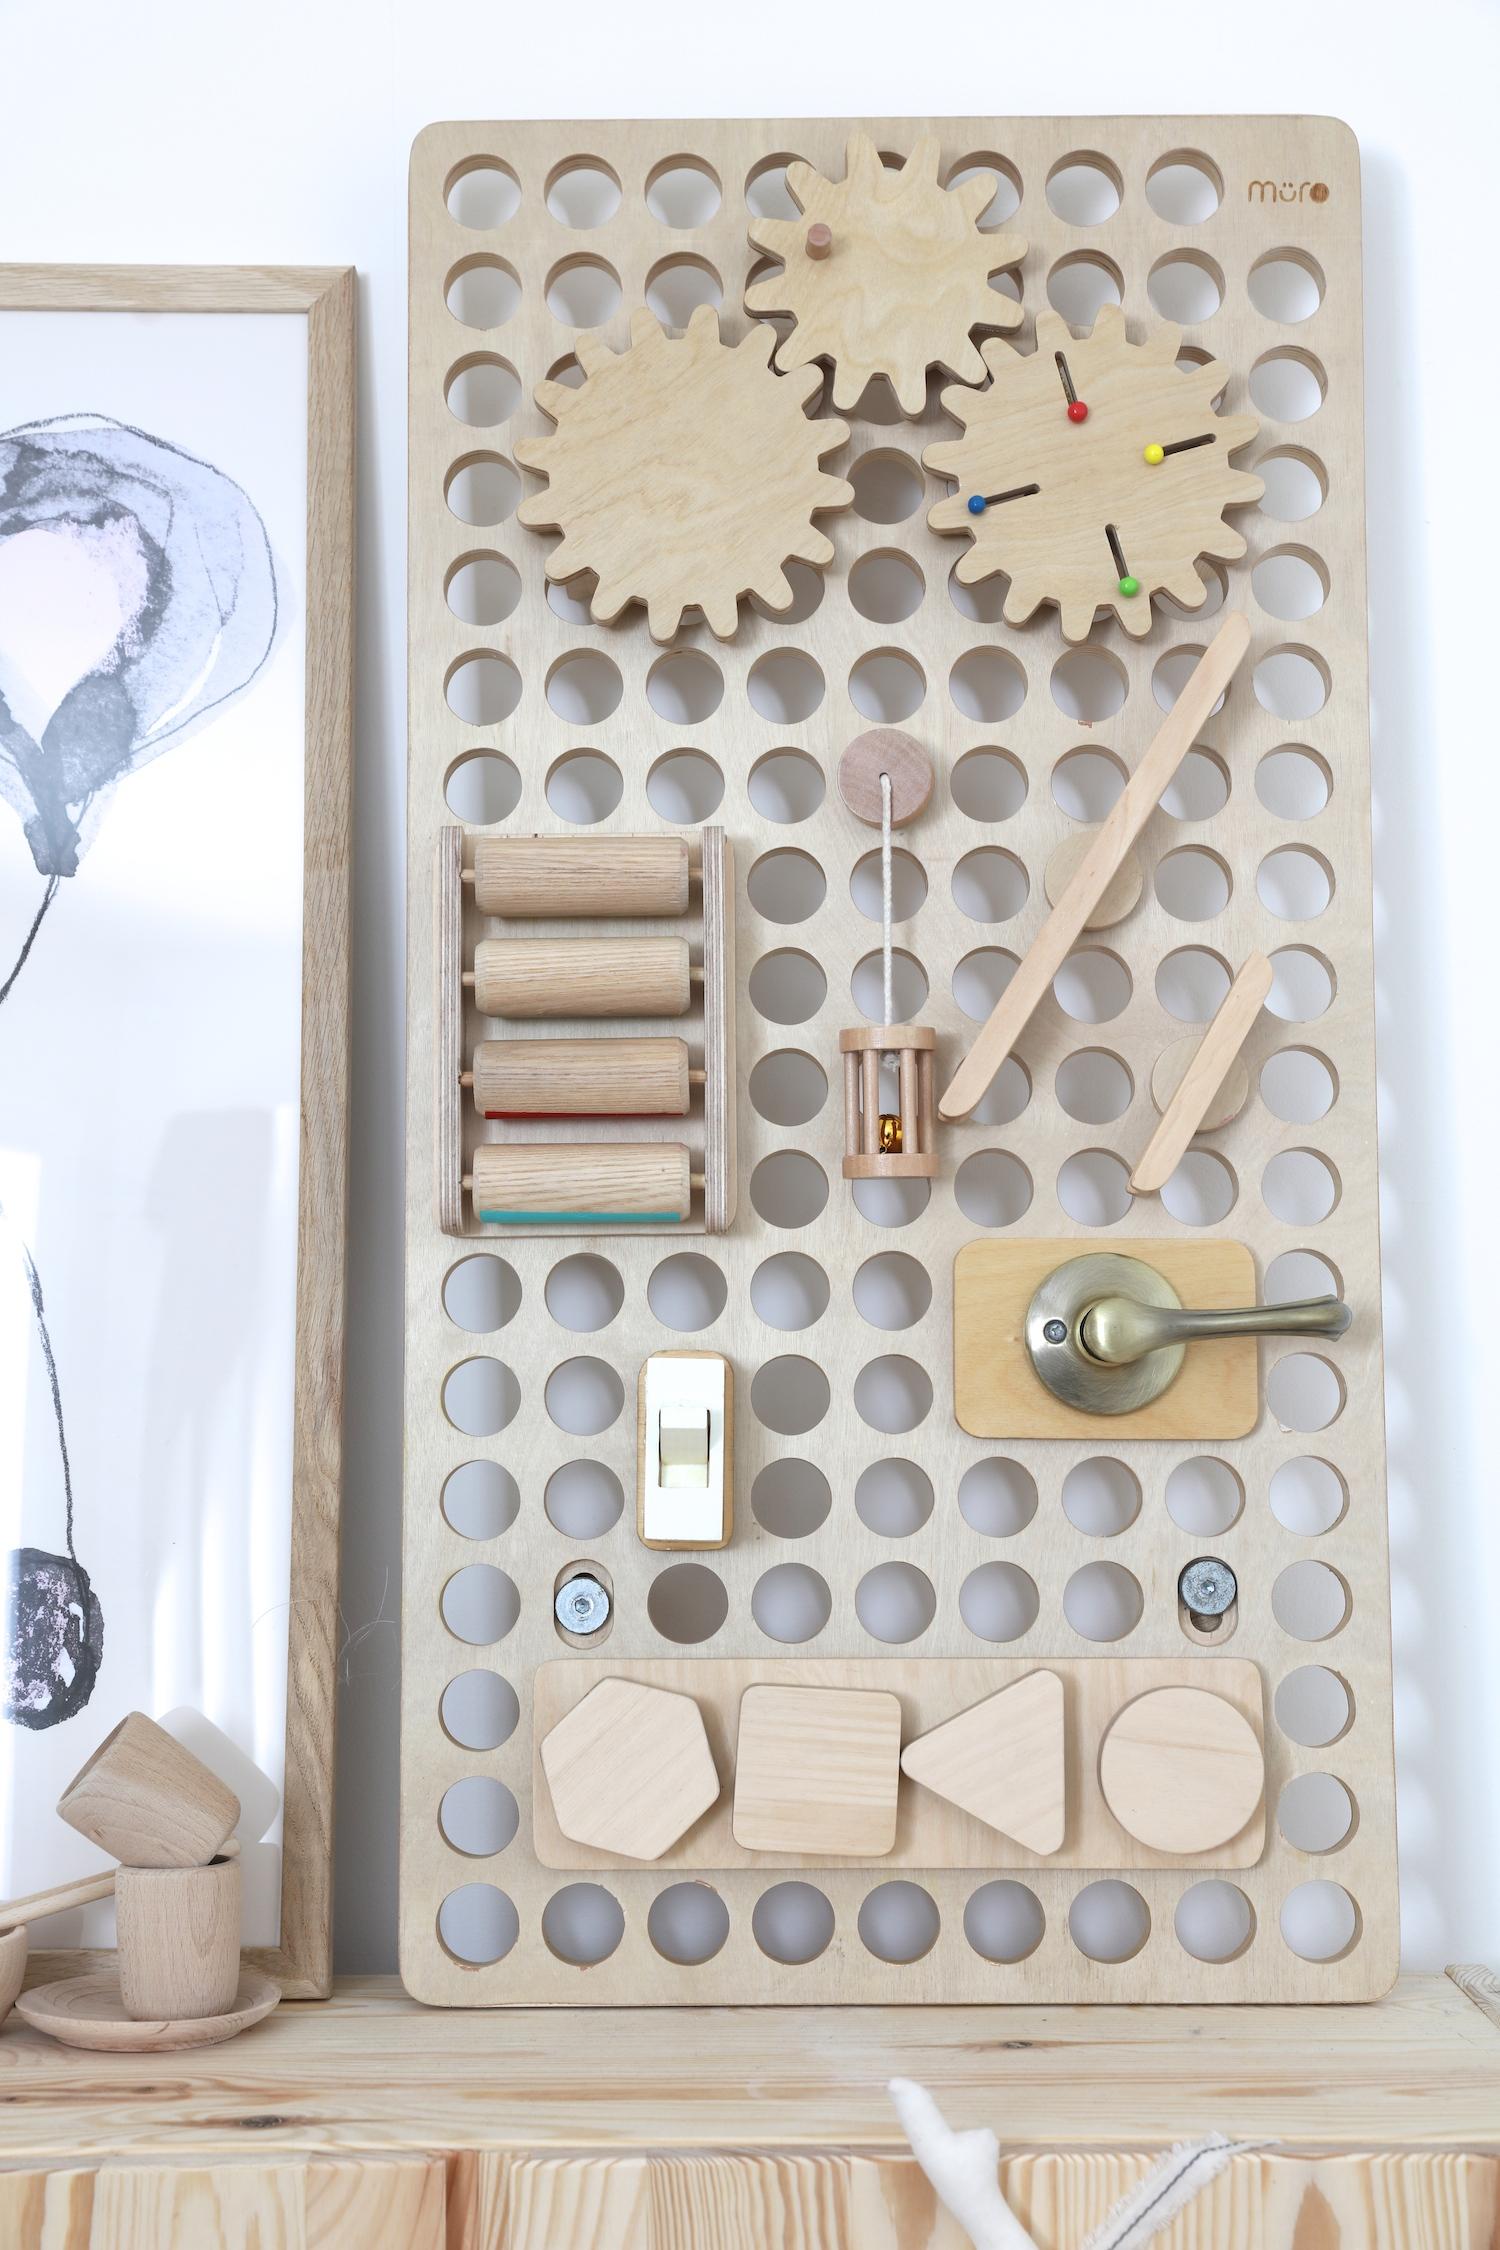 wooden_sensory_board_wall_kickstarter_my_muro